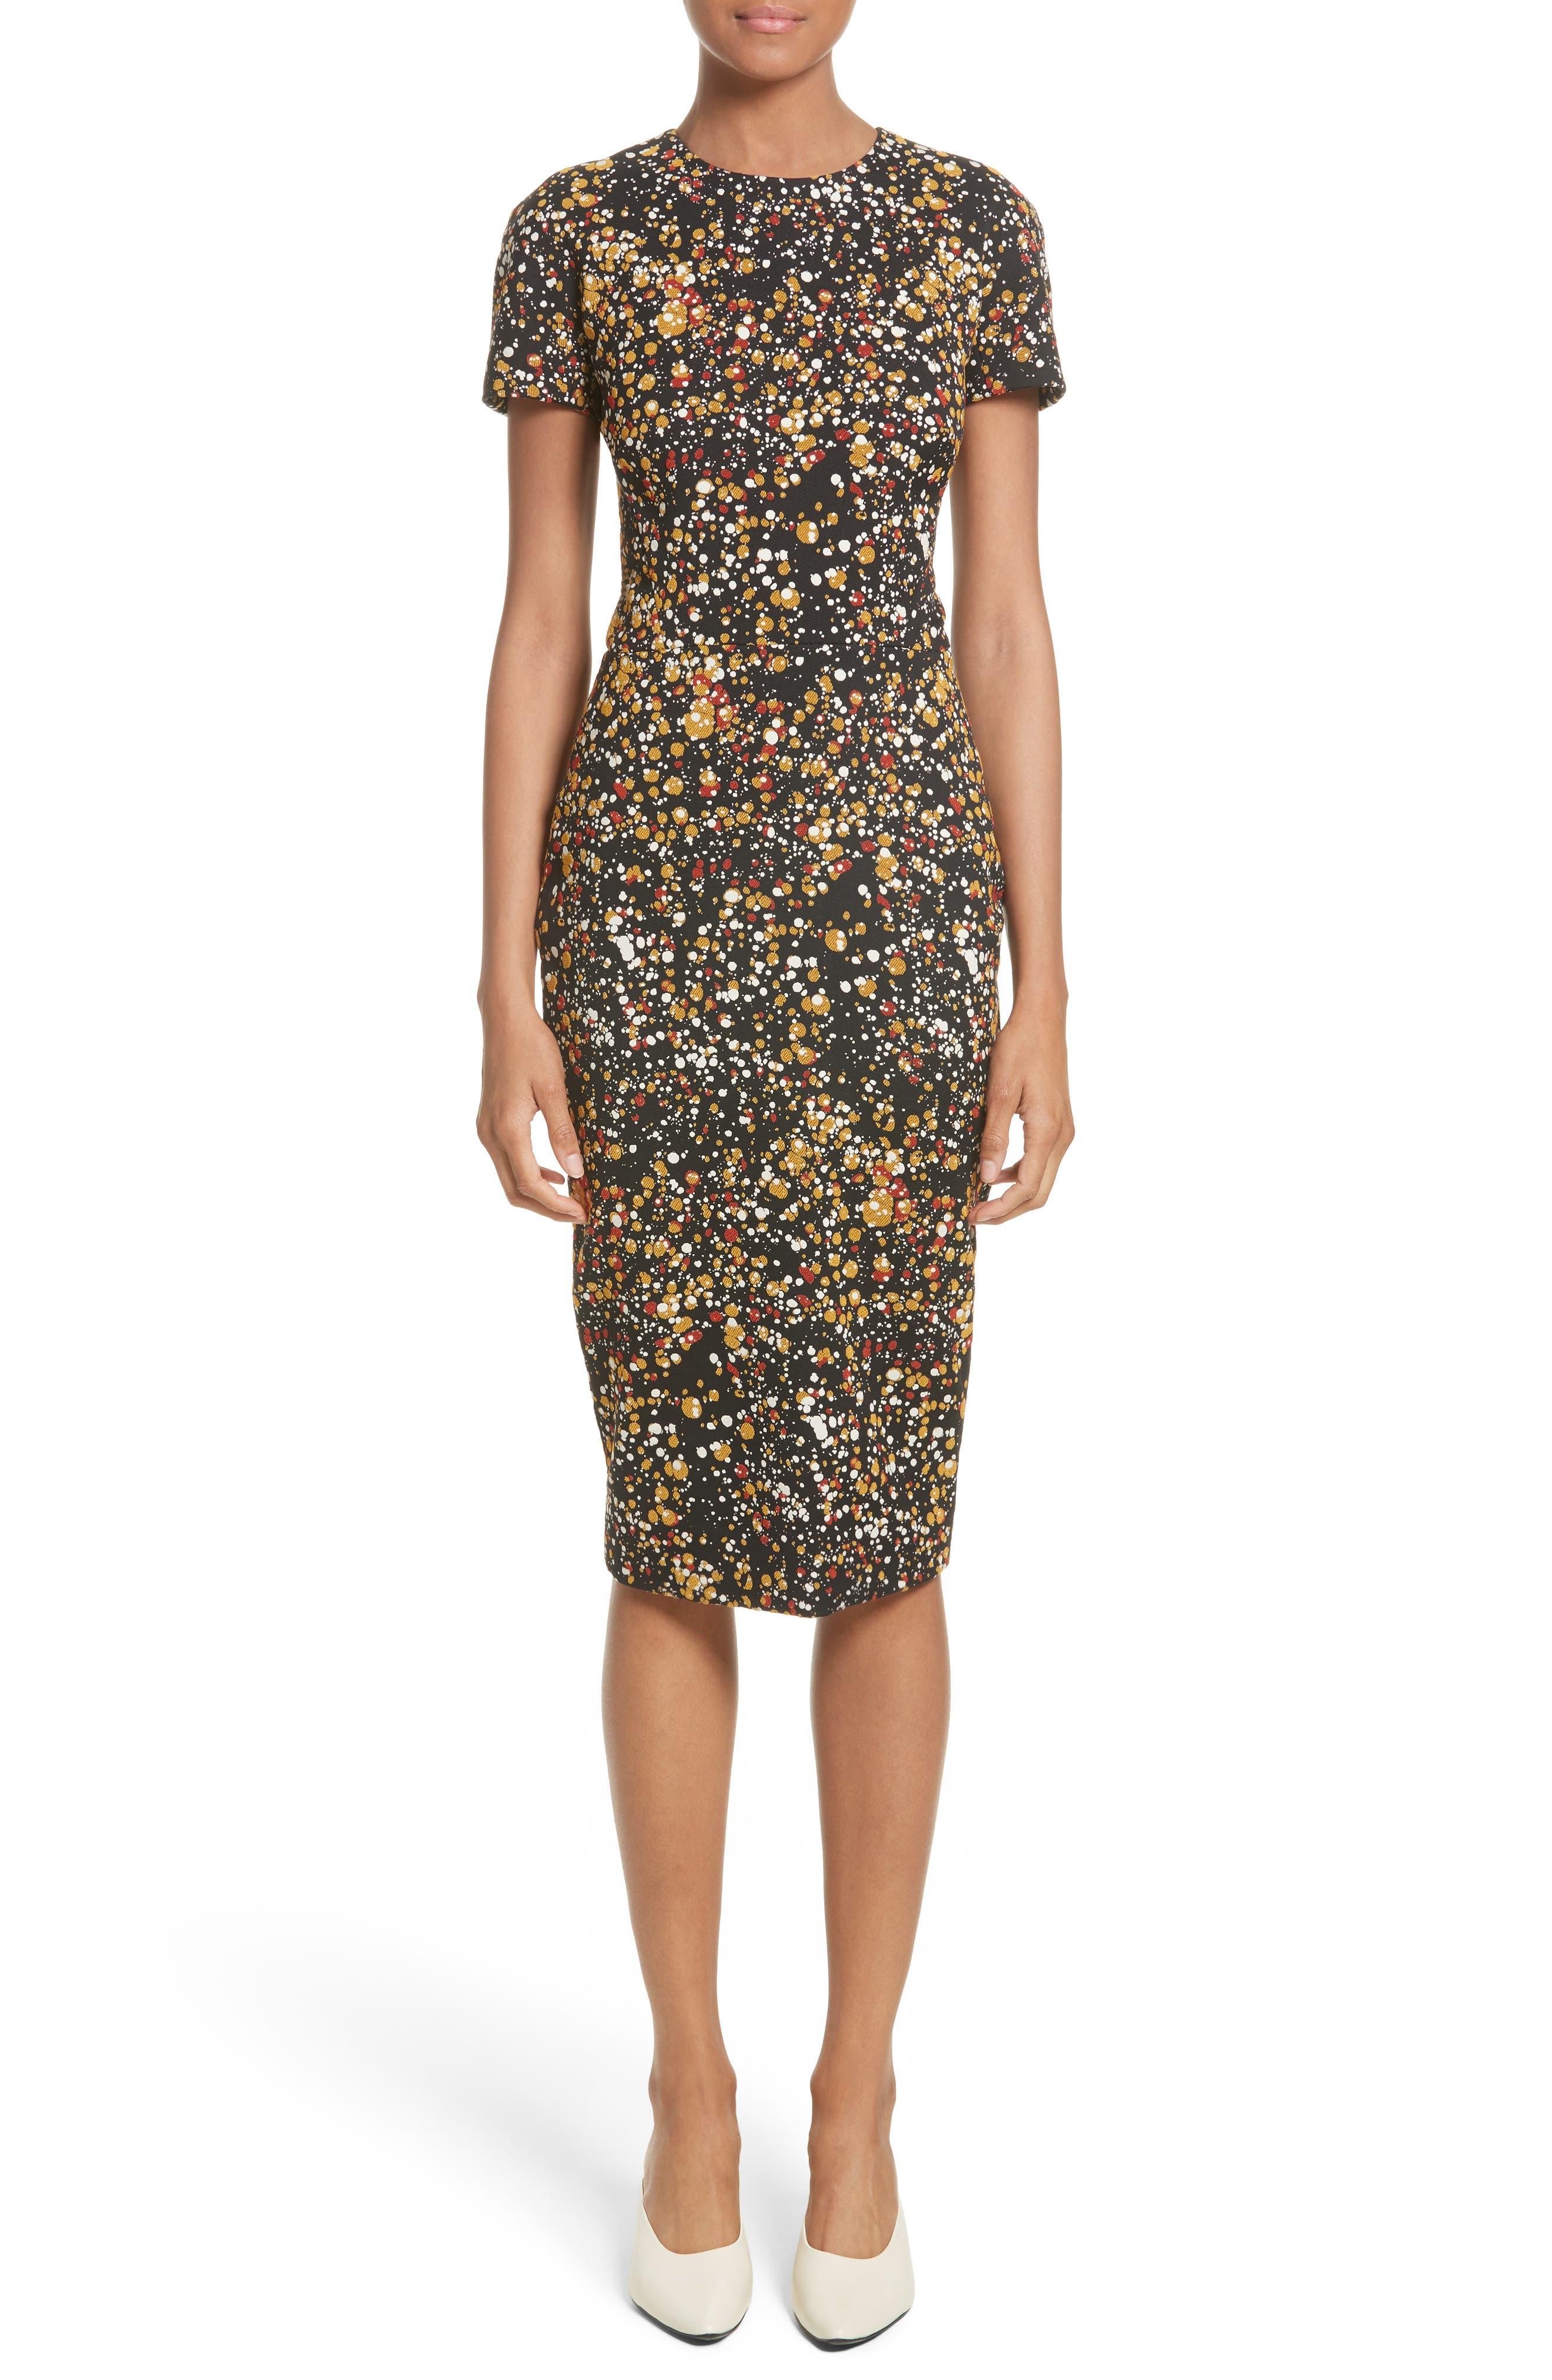 Alternate Image 1 Selected - Victoria Beckham Marble Jacquard Dress